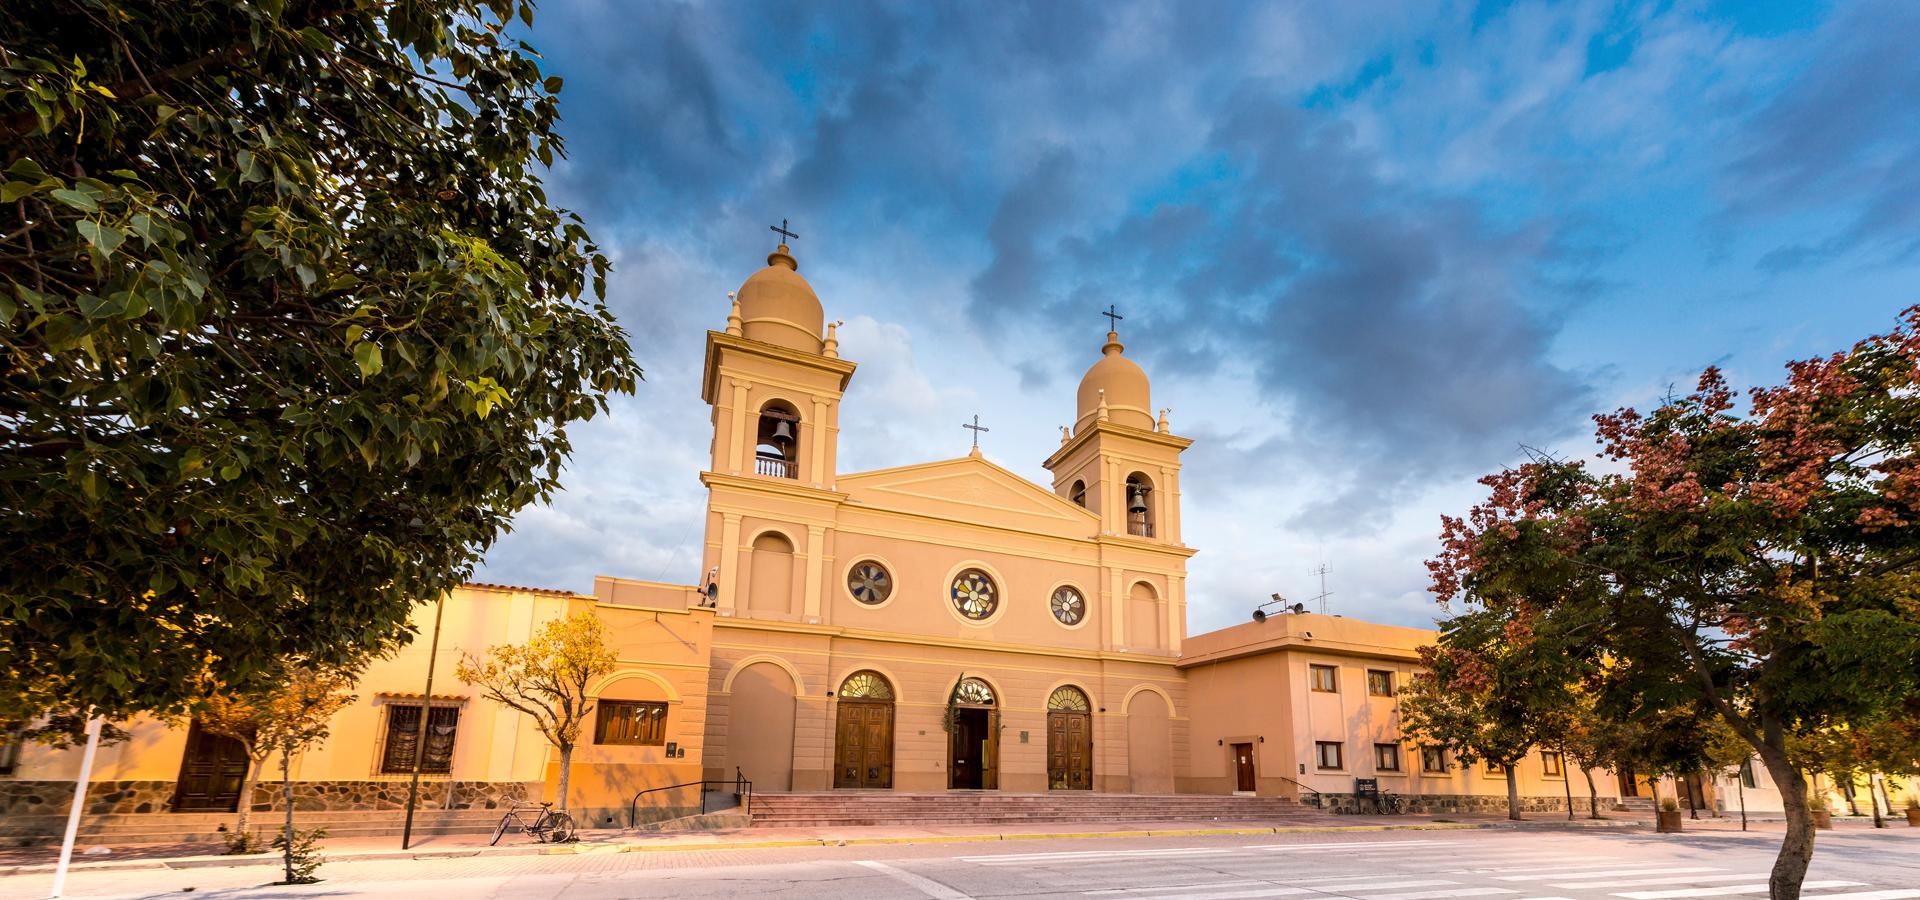 Peer-to-peer advisory in Salta, Argentina